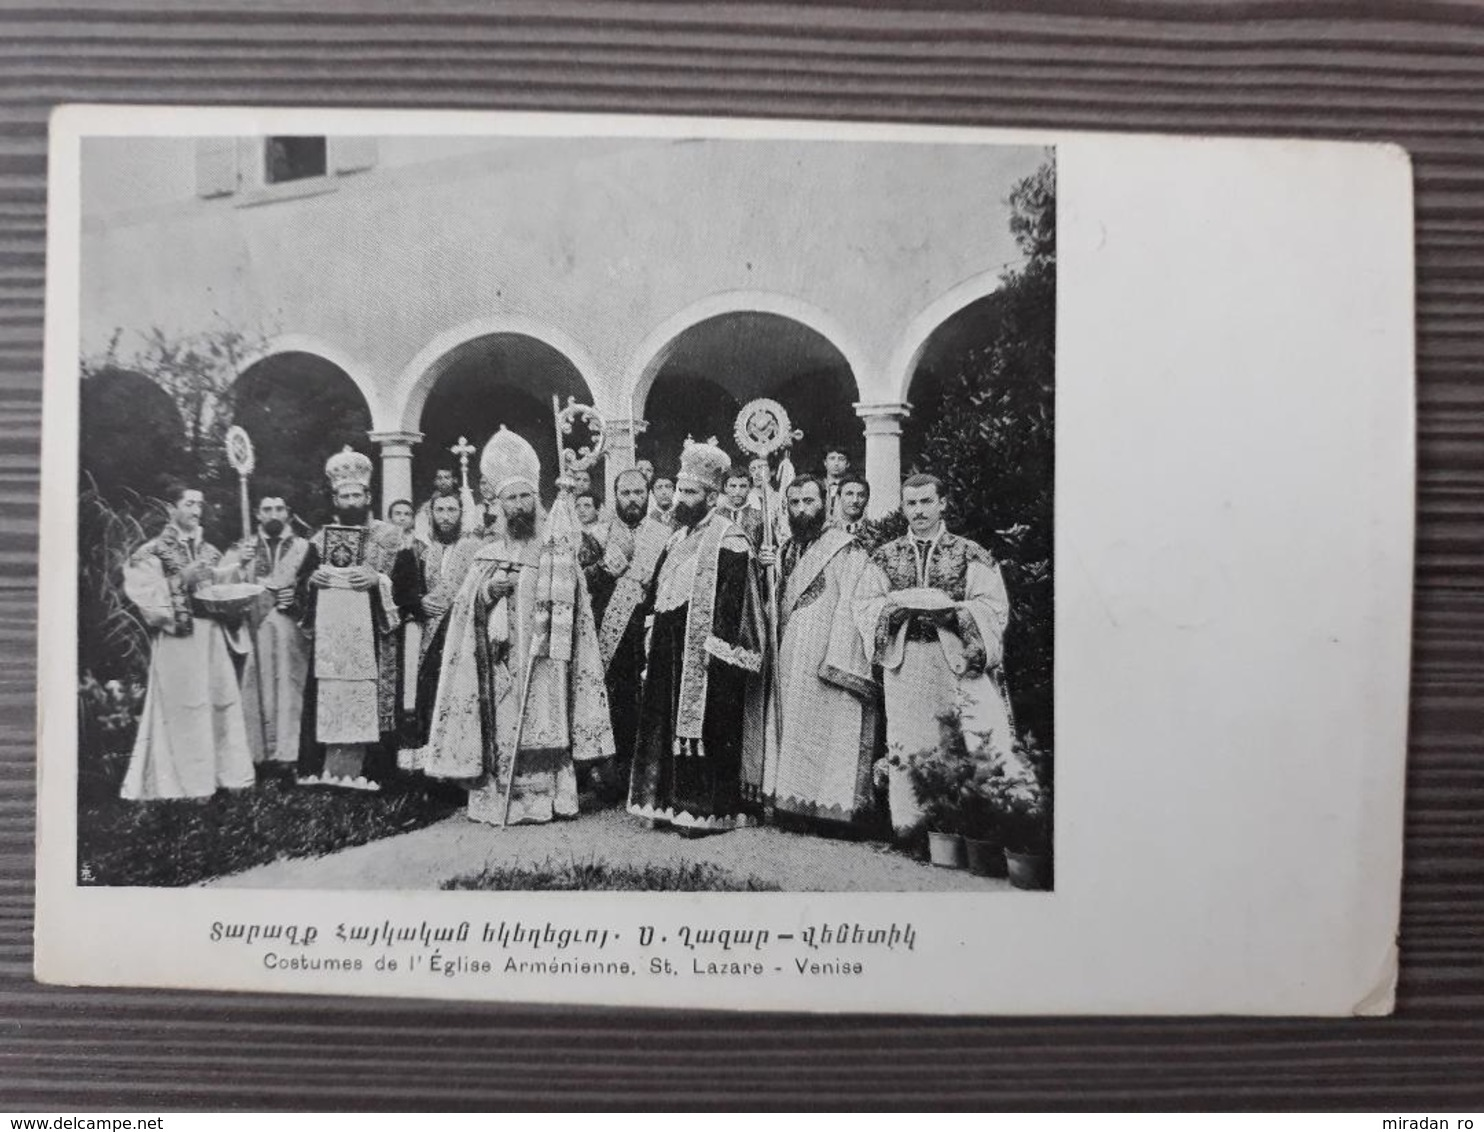 ITALY ARMENIA RARE POSTCARD ANSICHTSKARTEN COSTUMES DE L EGLISE ARMENIENNE - Venezia (Venice)